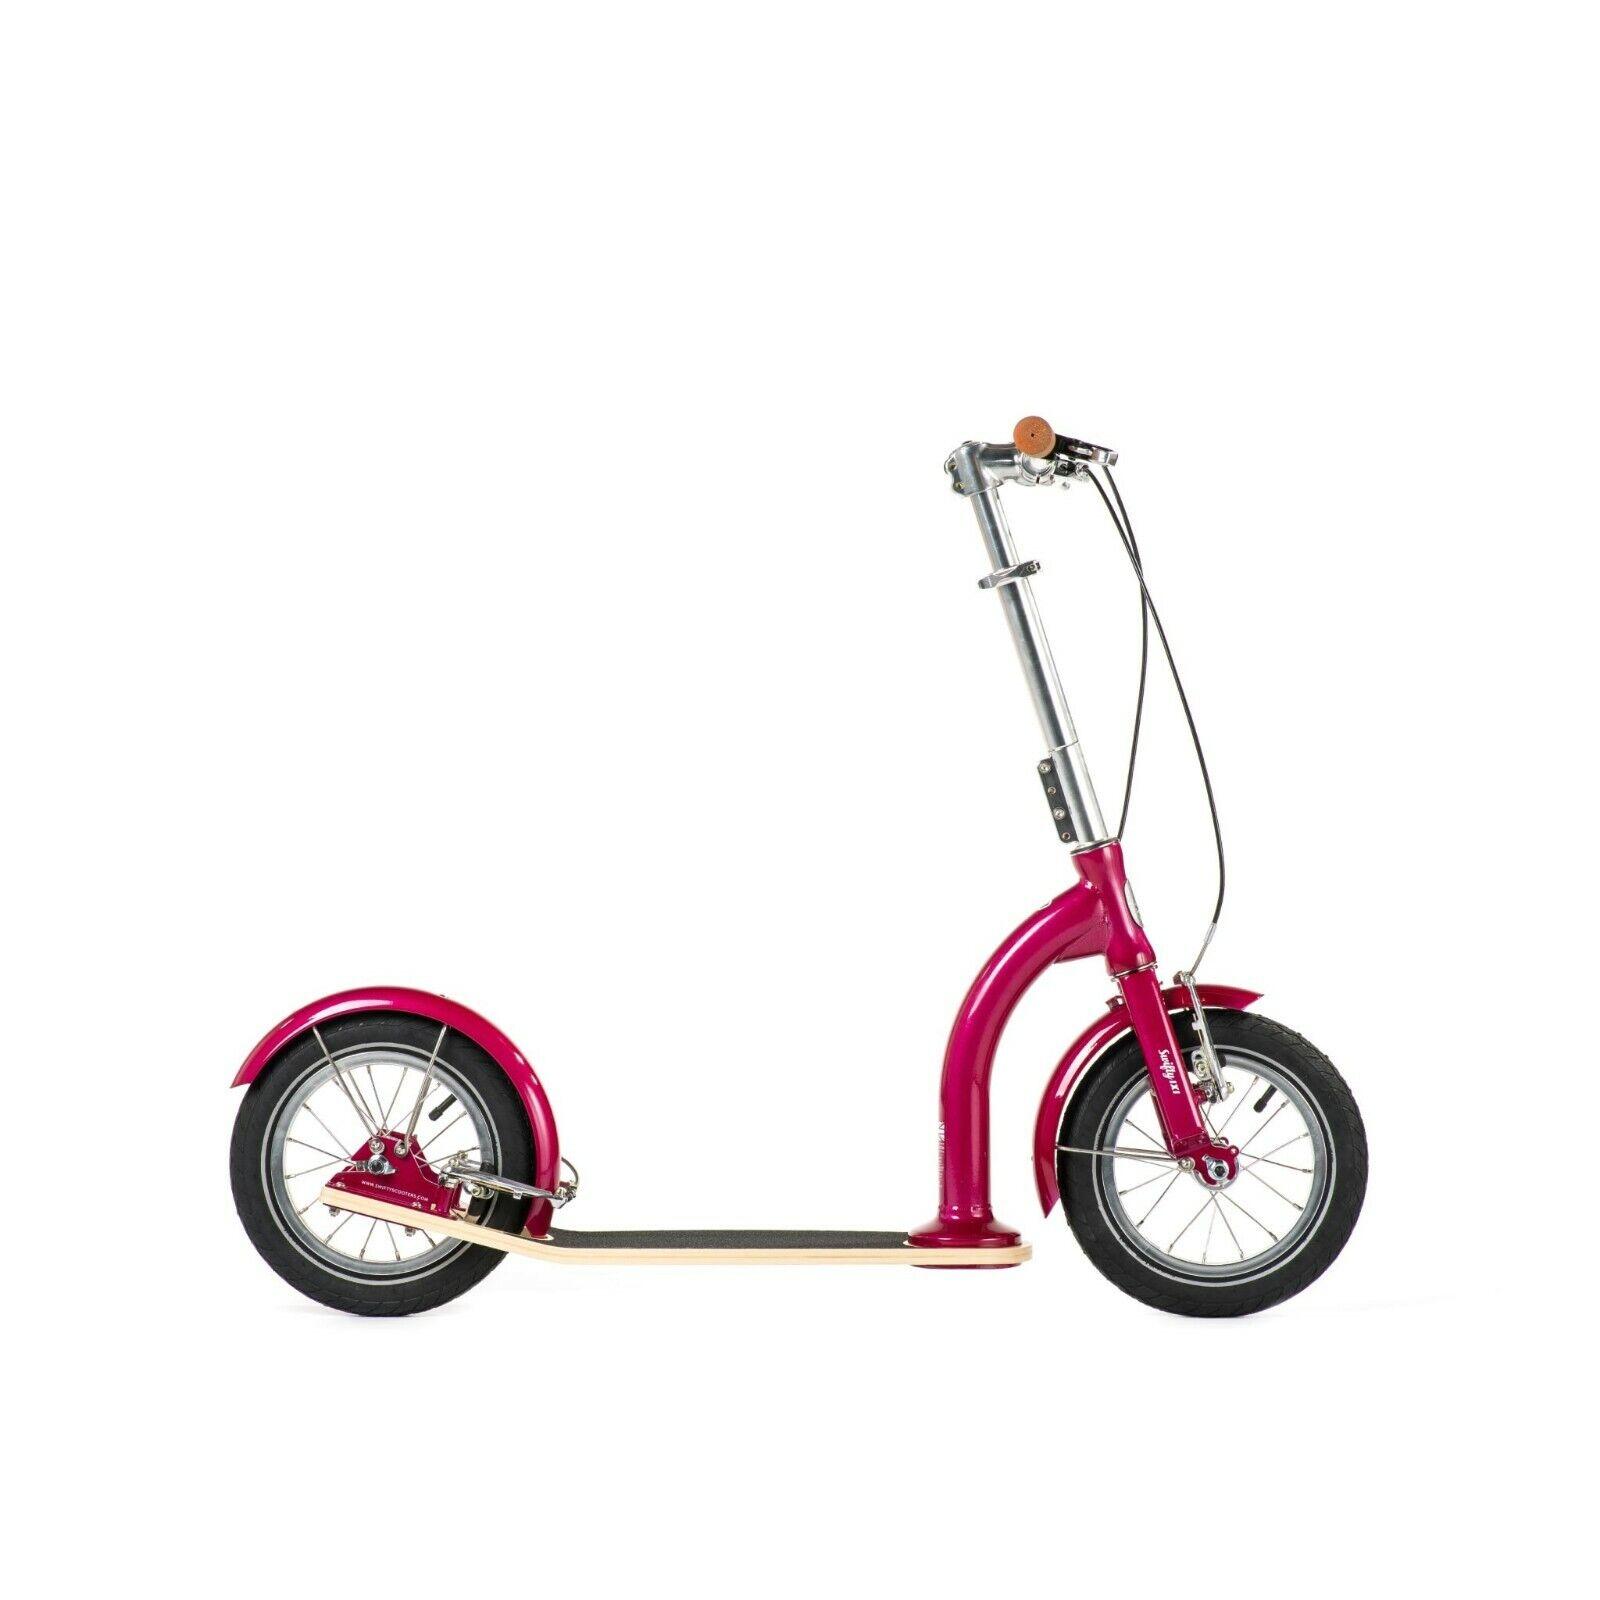 Premium Triciclo Bambini Scooter 712 YO   swiftyixi   Swifty SCOOTER   Lampone